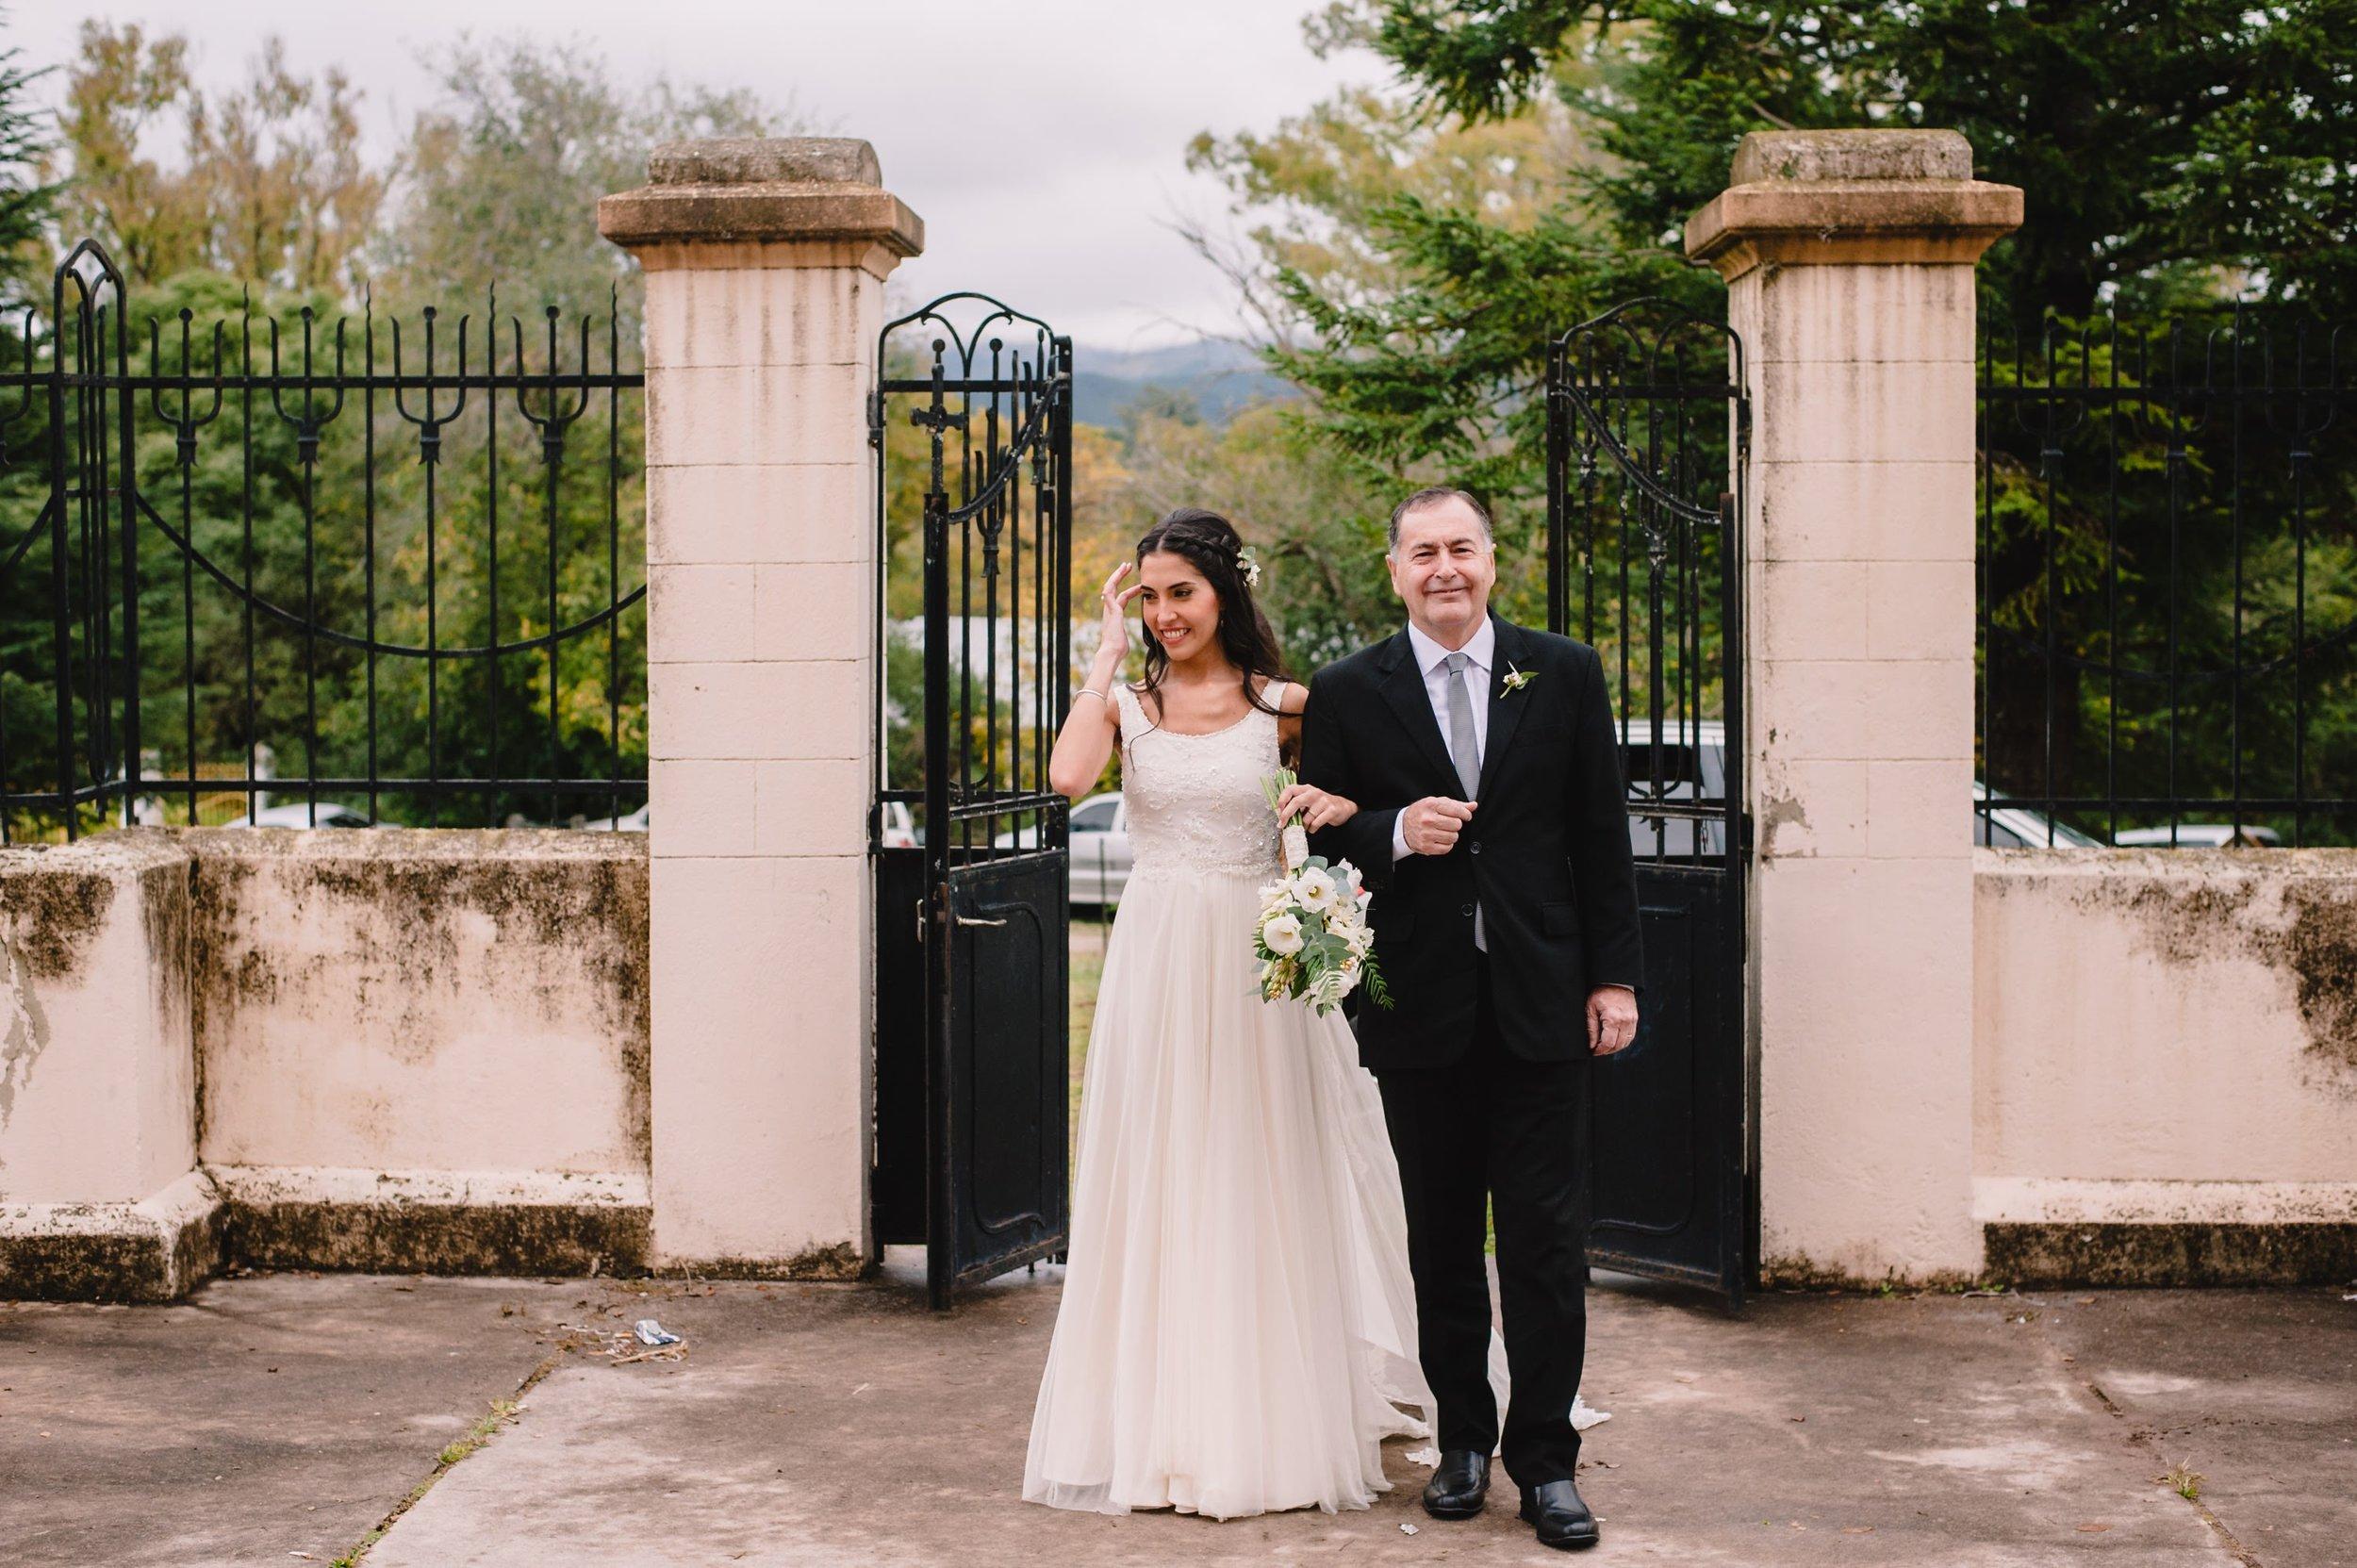 fotografo de bodas en carlos paz cordoba 020.JPG